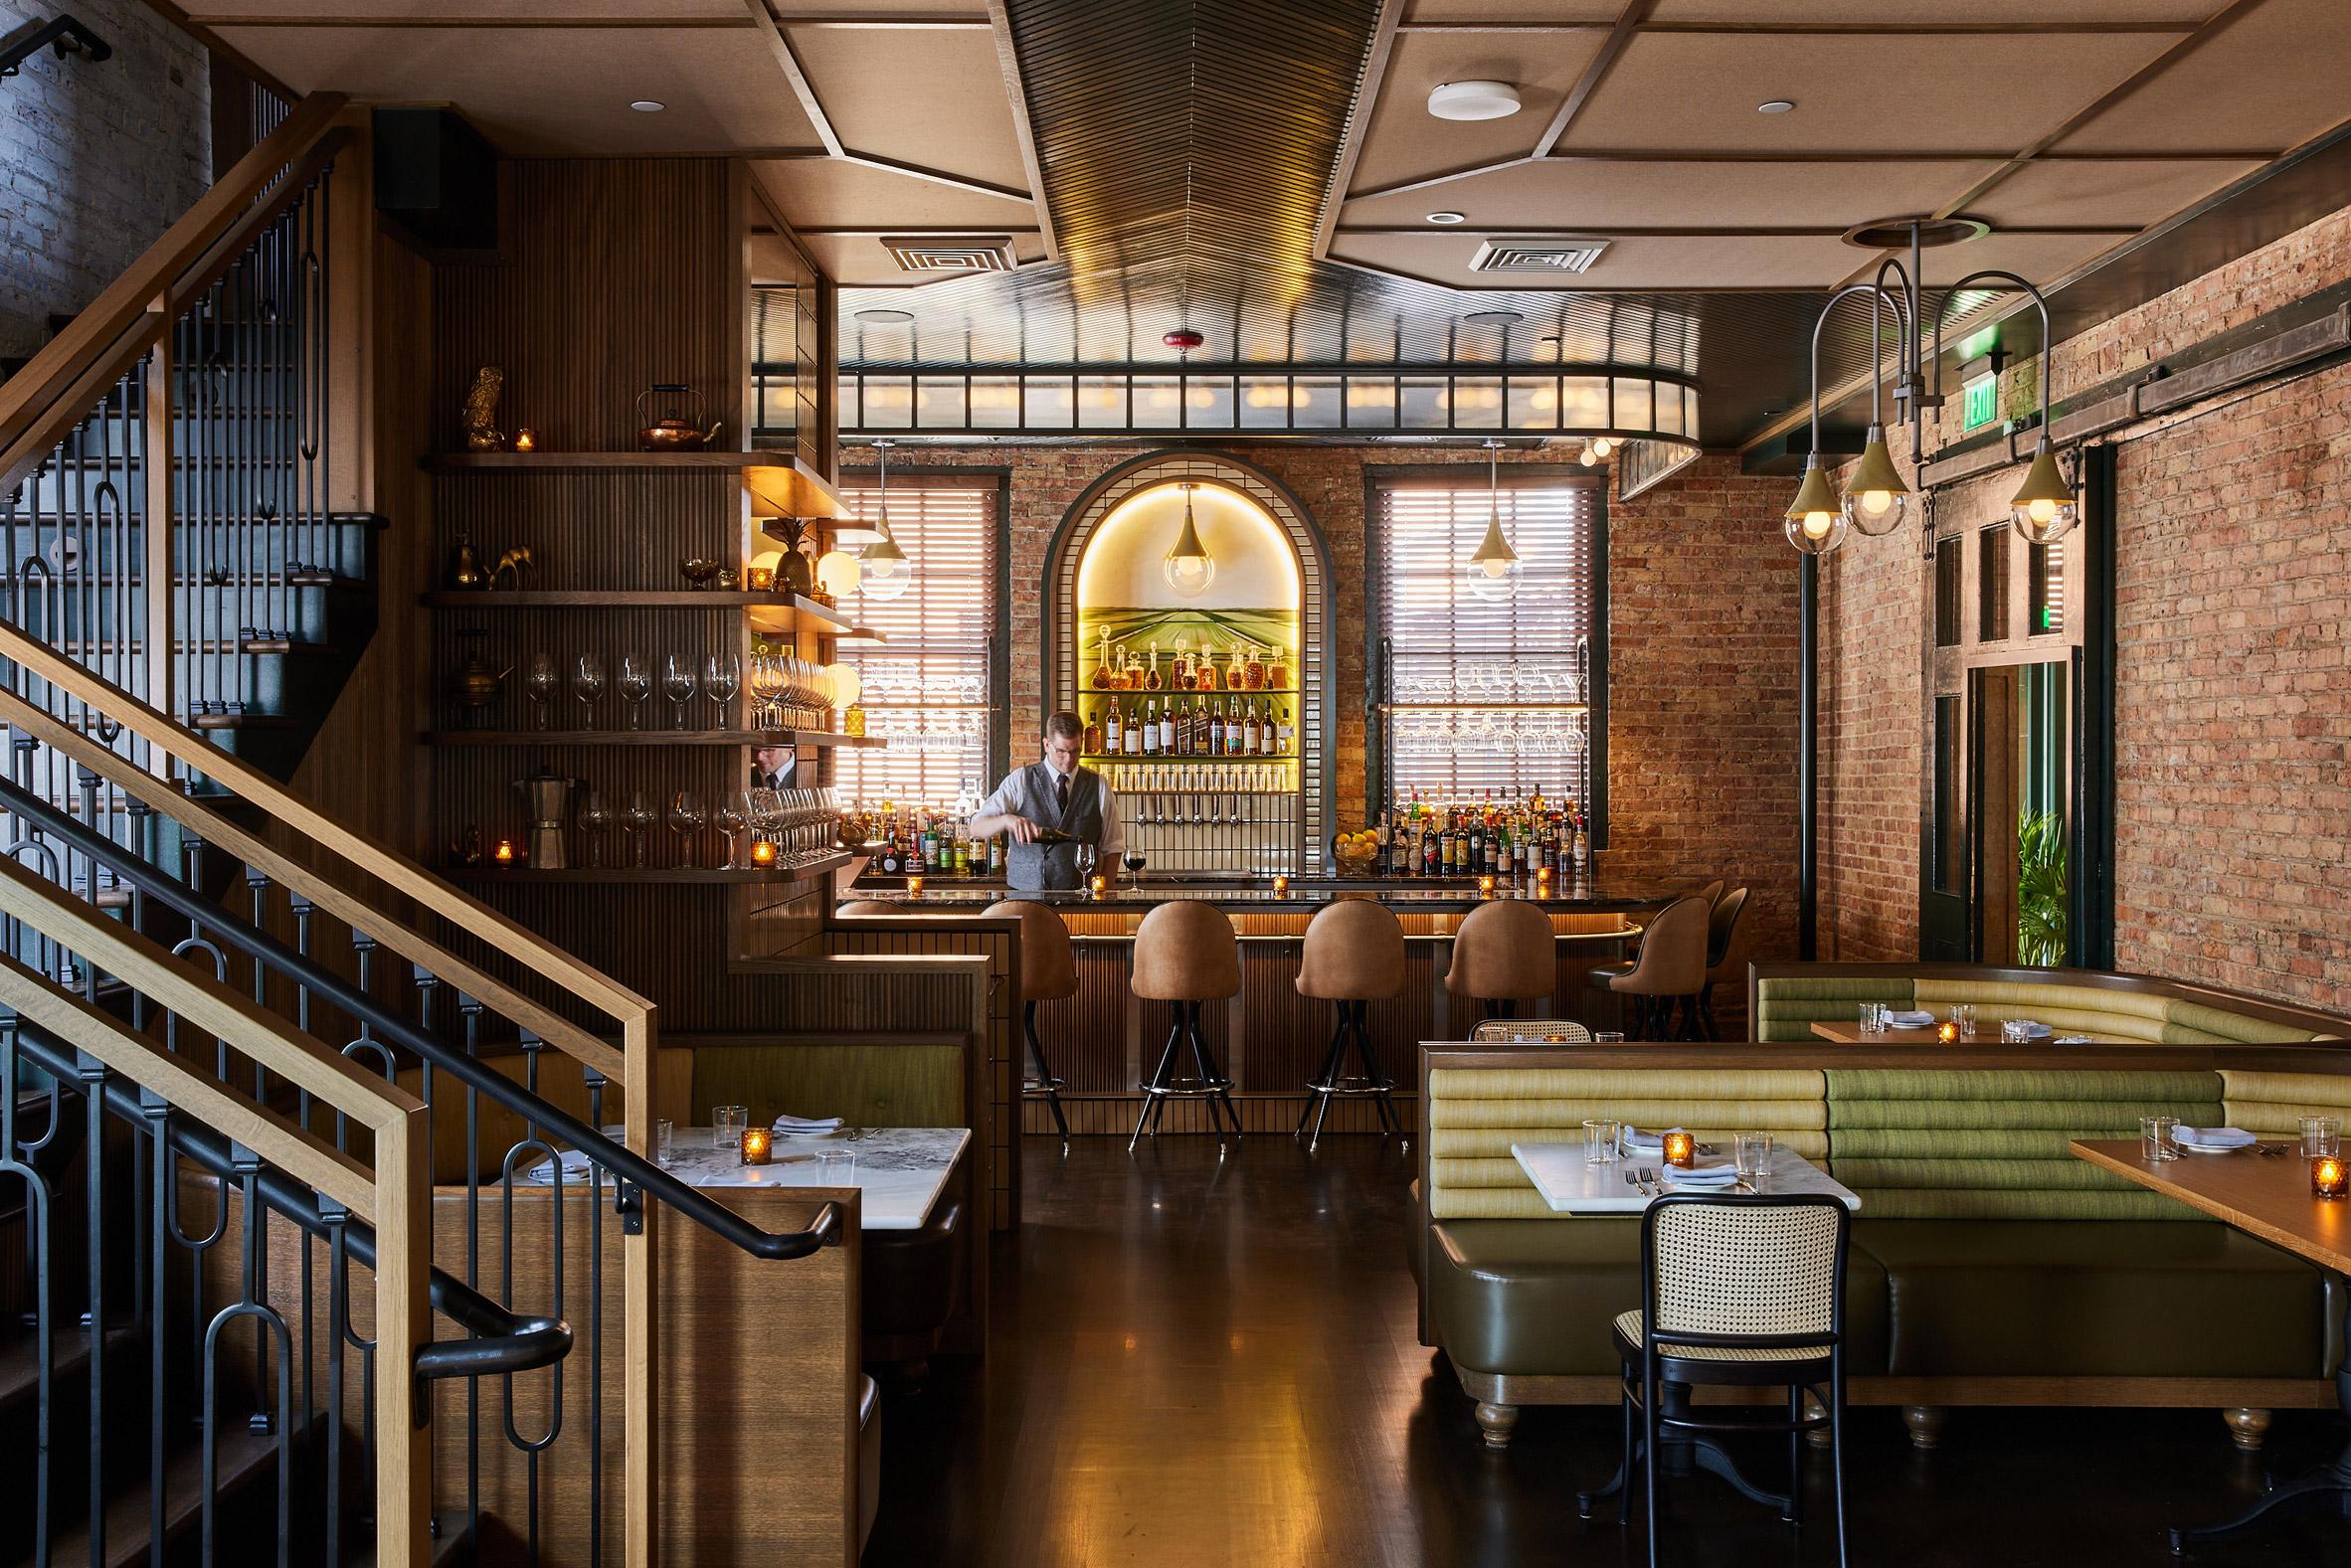 Ground floor of The Harvey House restaurant